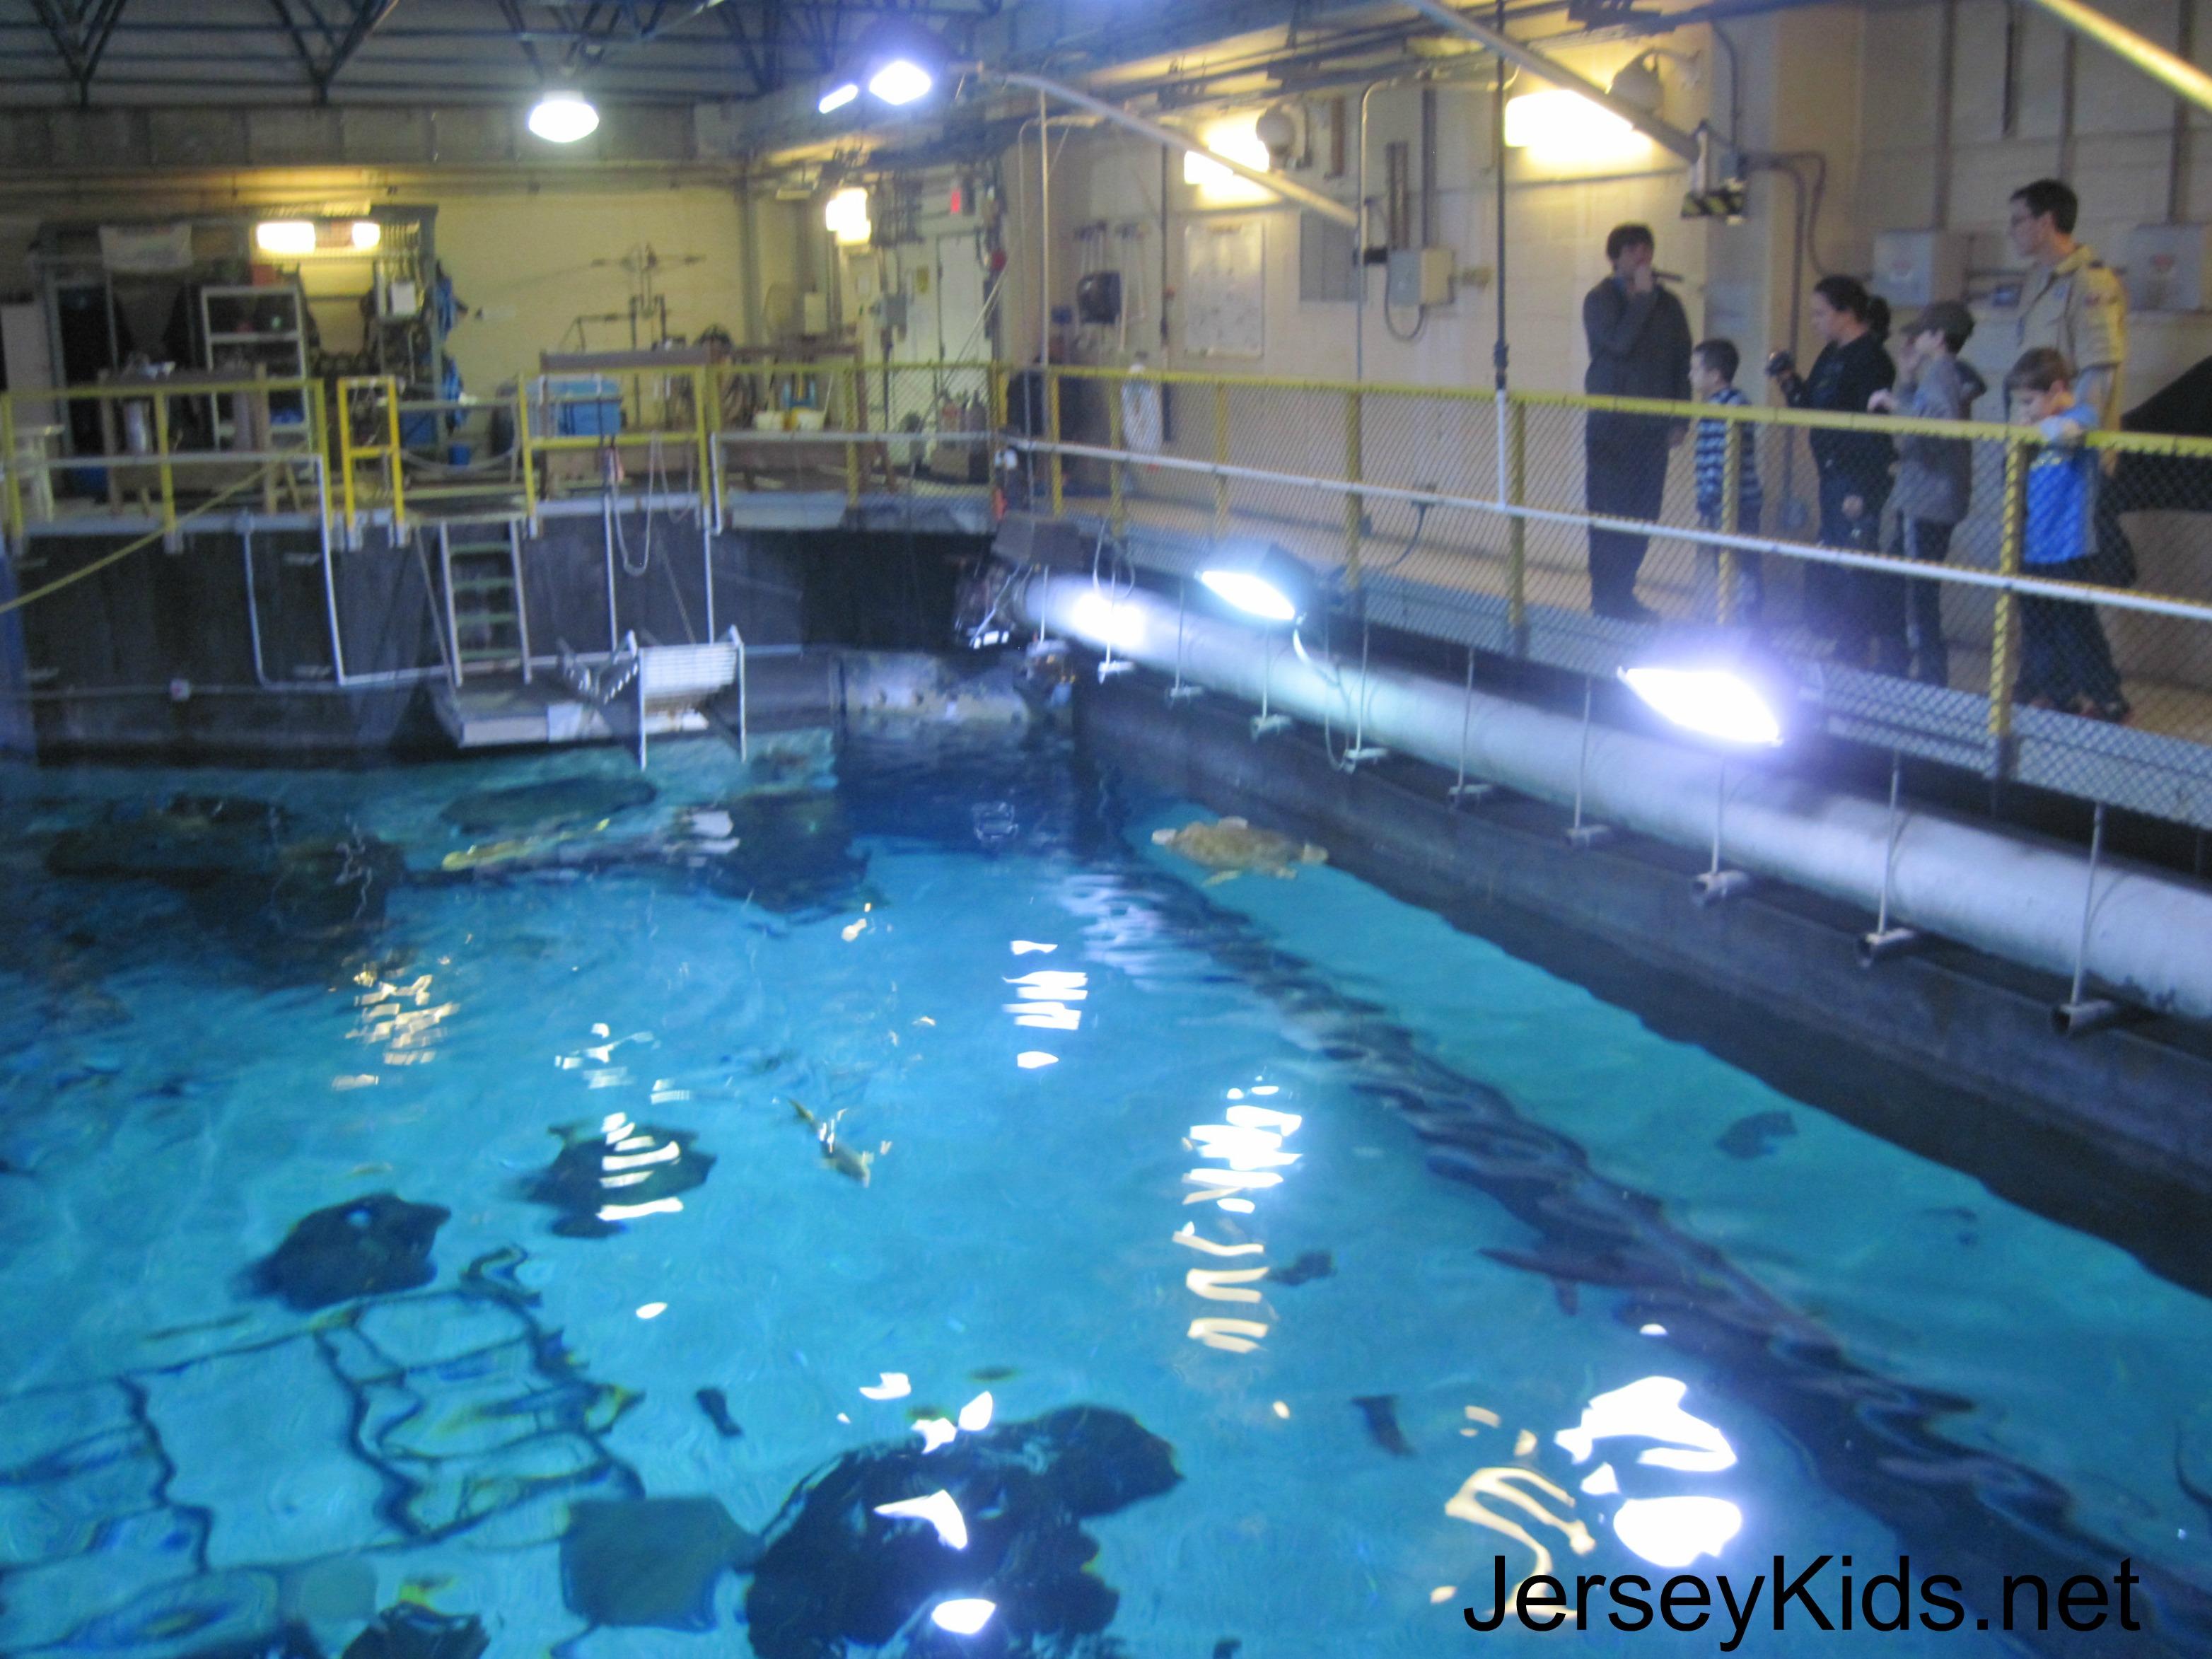 Sleeping With The Fish Overnight At Adventure Aquarium In